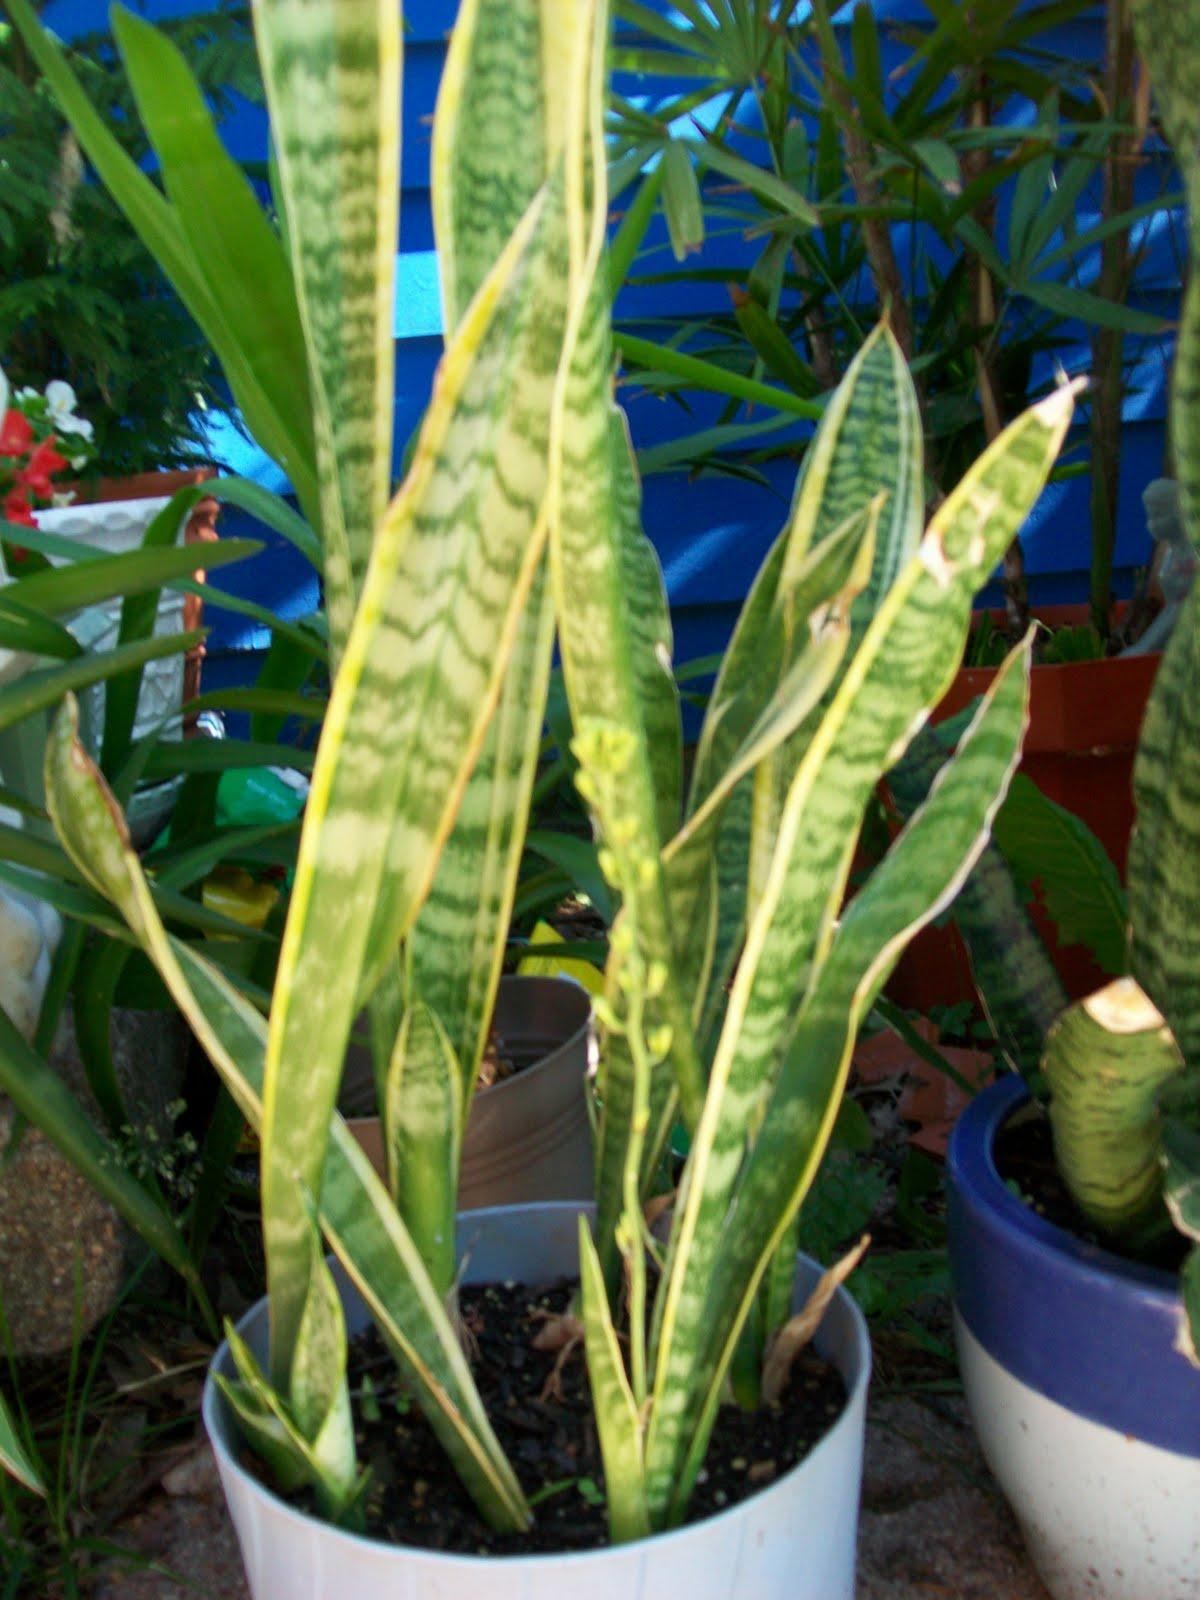 ducky u0026 39 s little rainbow flower pot  snake plant